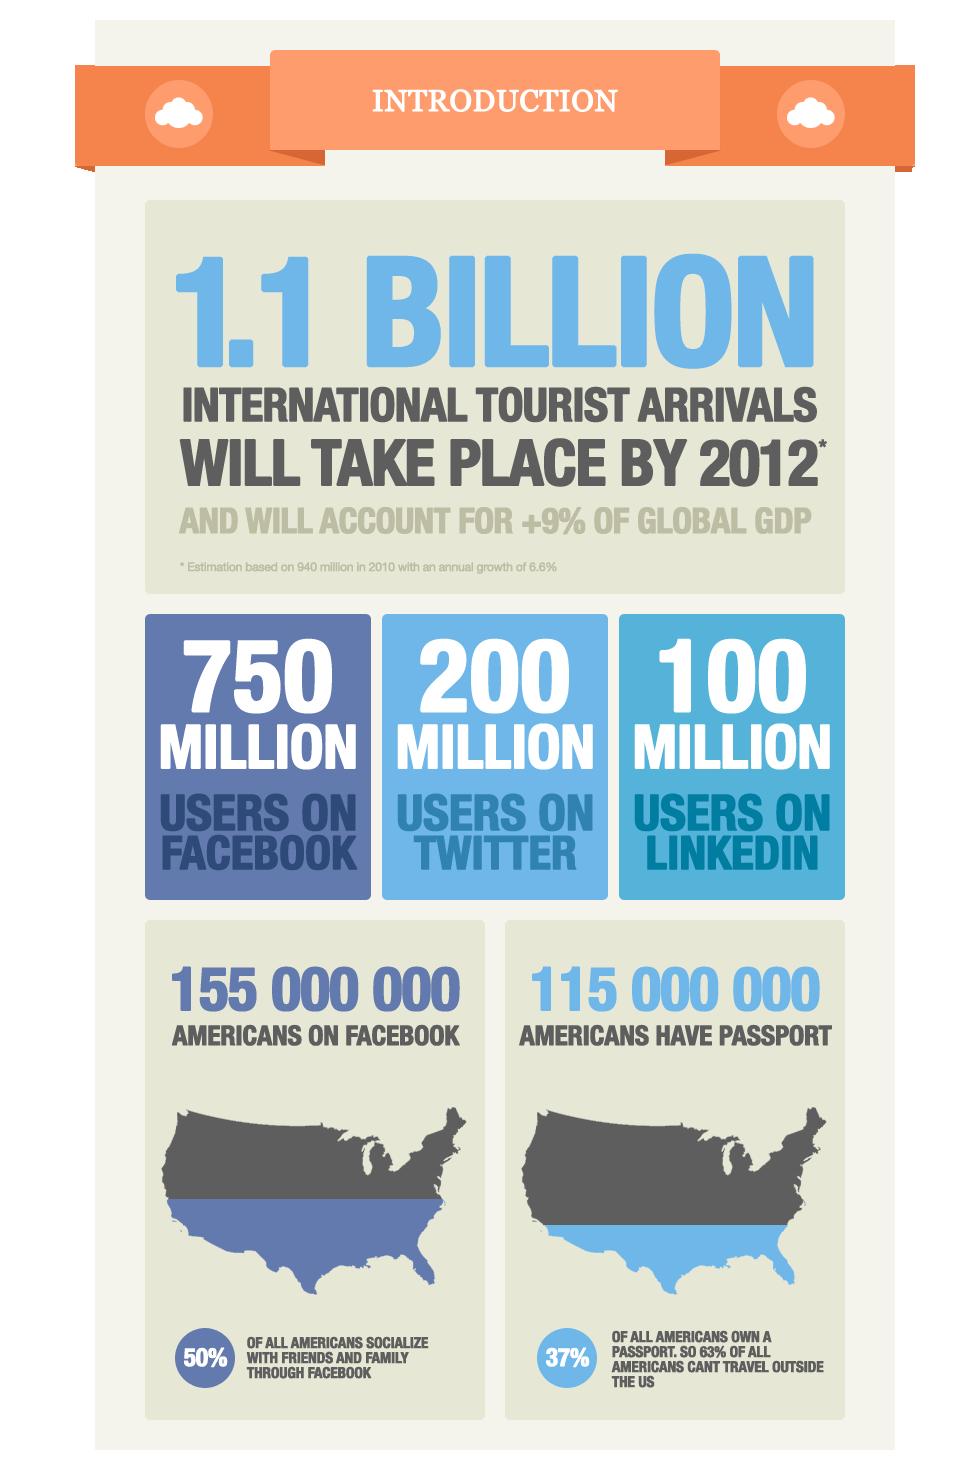 The Social Travel Revolution... $1.1 billion international tourist arrivals will take place in 2012